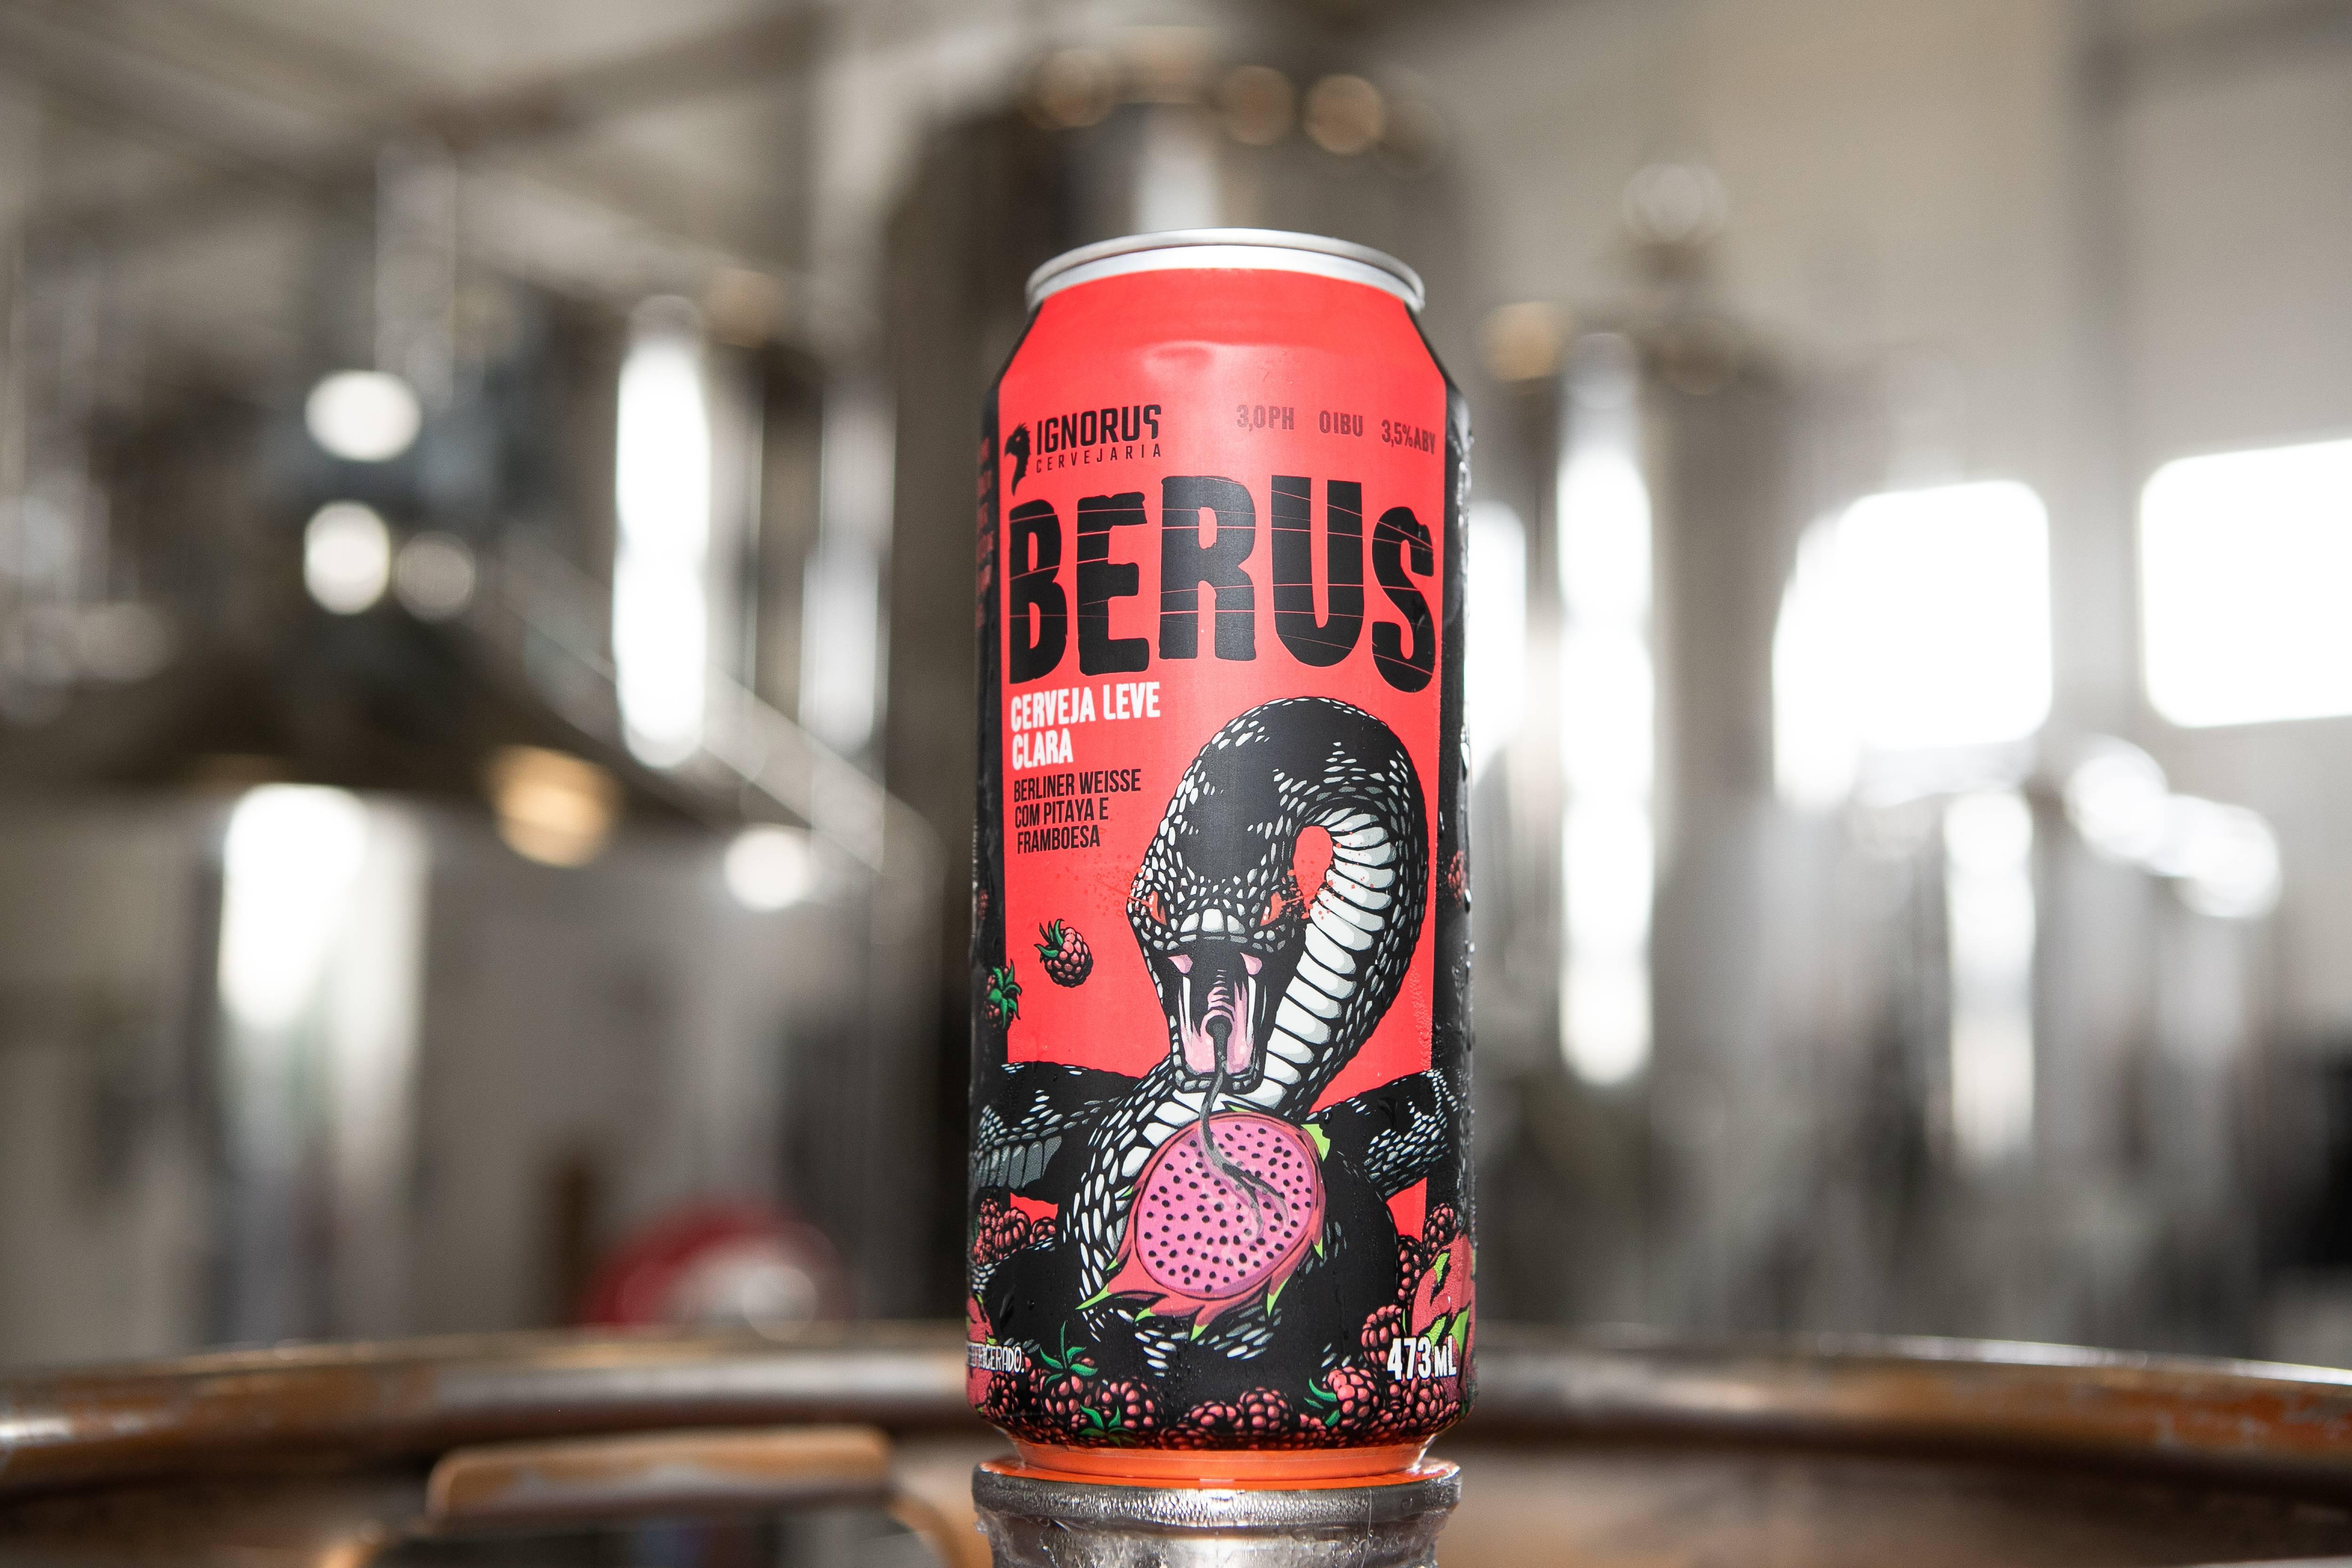 Berus: 3,5% / American Sour Beer com framboesas e pitaia, 473 ml - Preço: R$ 21,90.